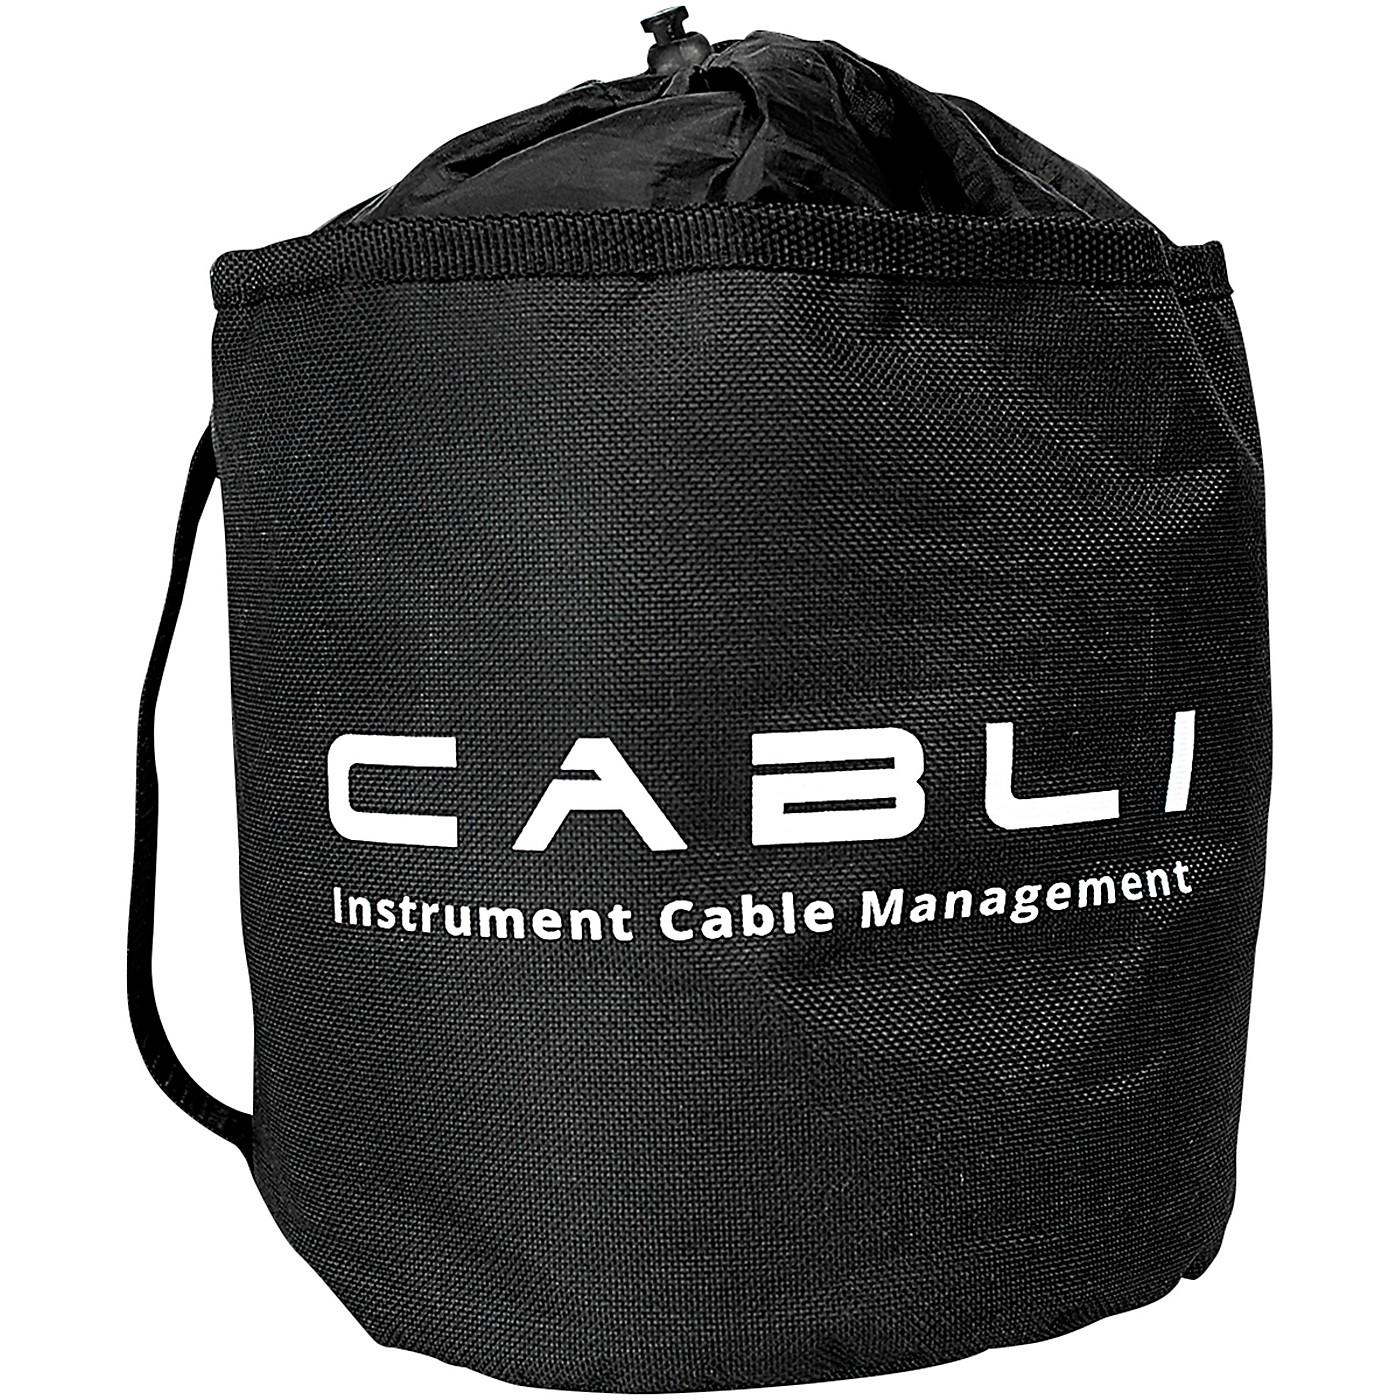 Singular Sound Cabli Gig Bag thumbnail